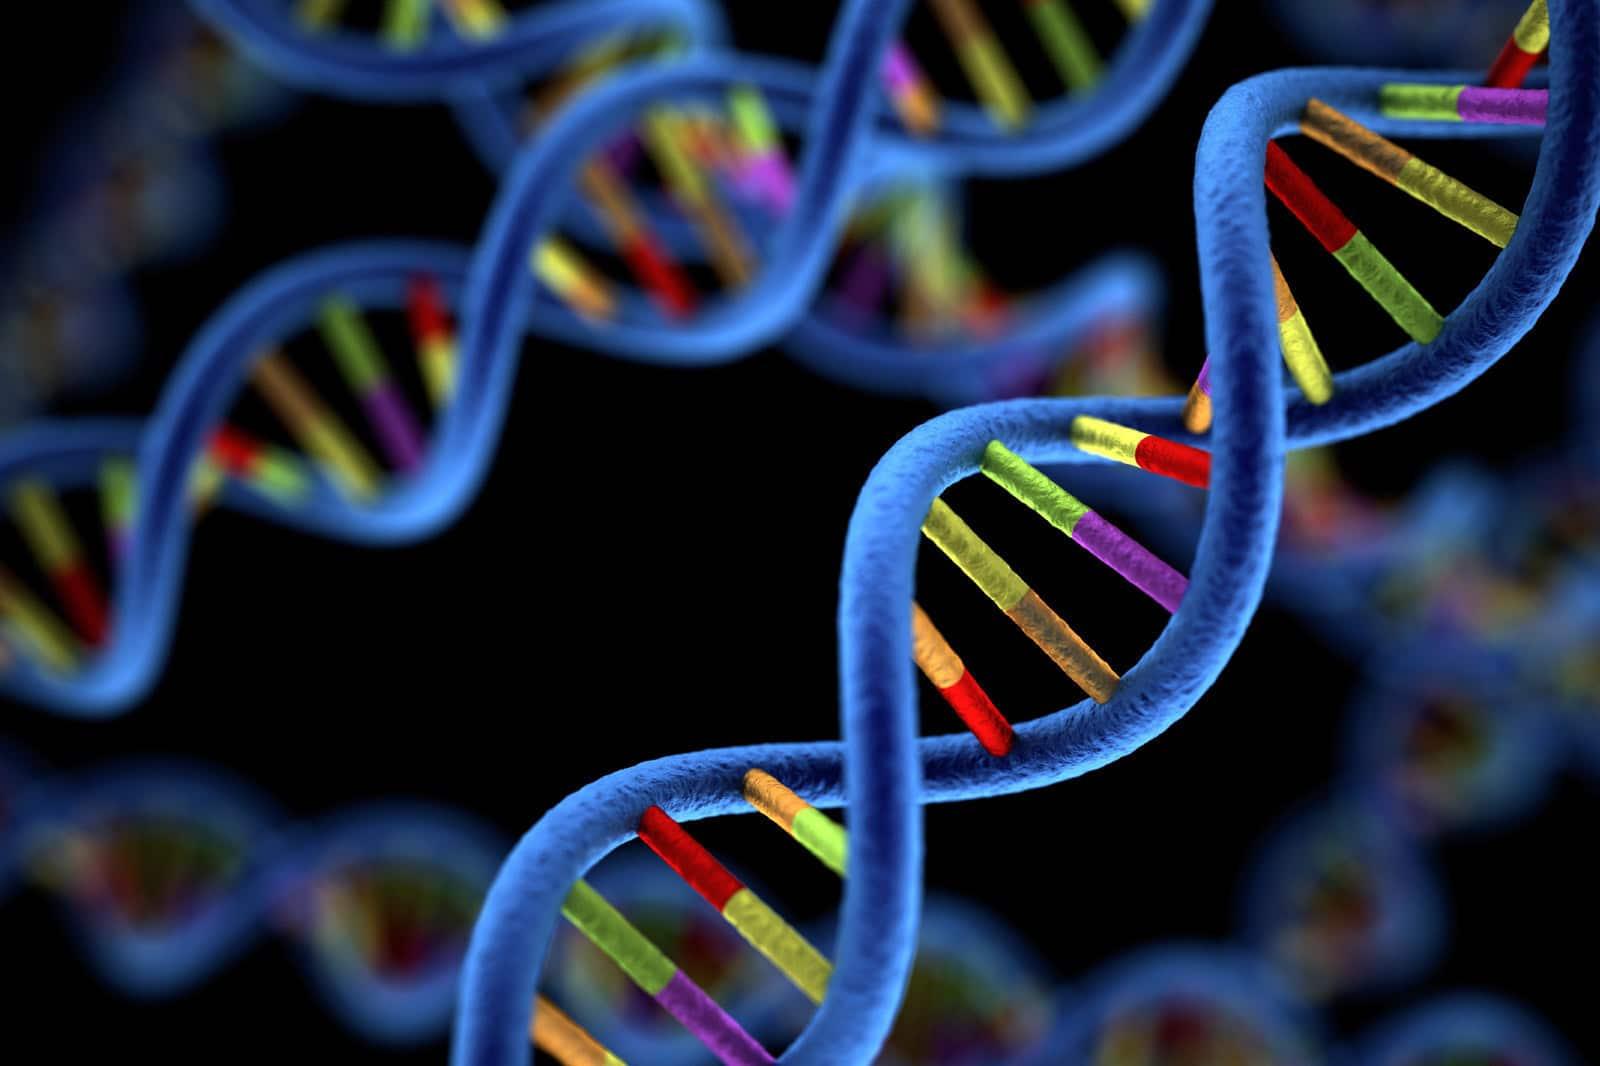 Iit Kharagpur To Launch India U0026 39 S First Genomics Lab Facility